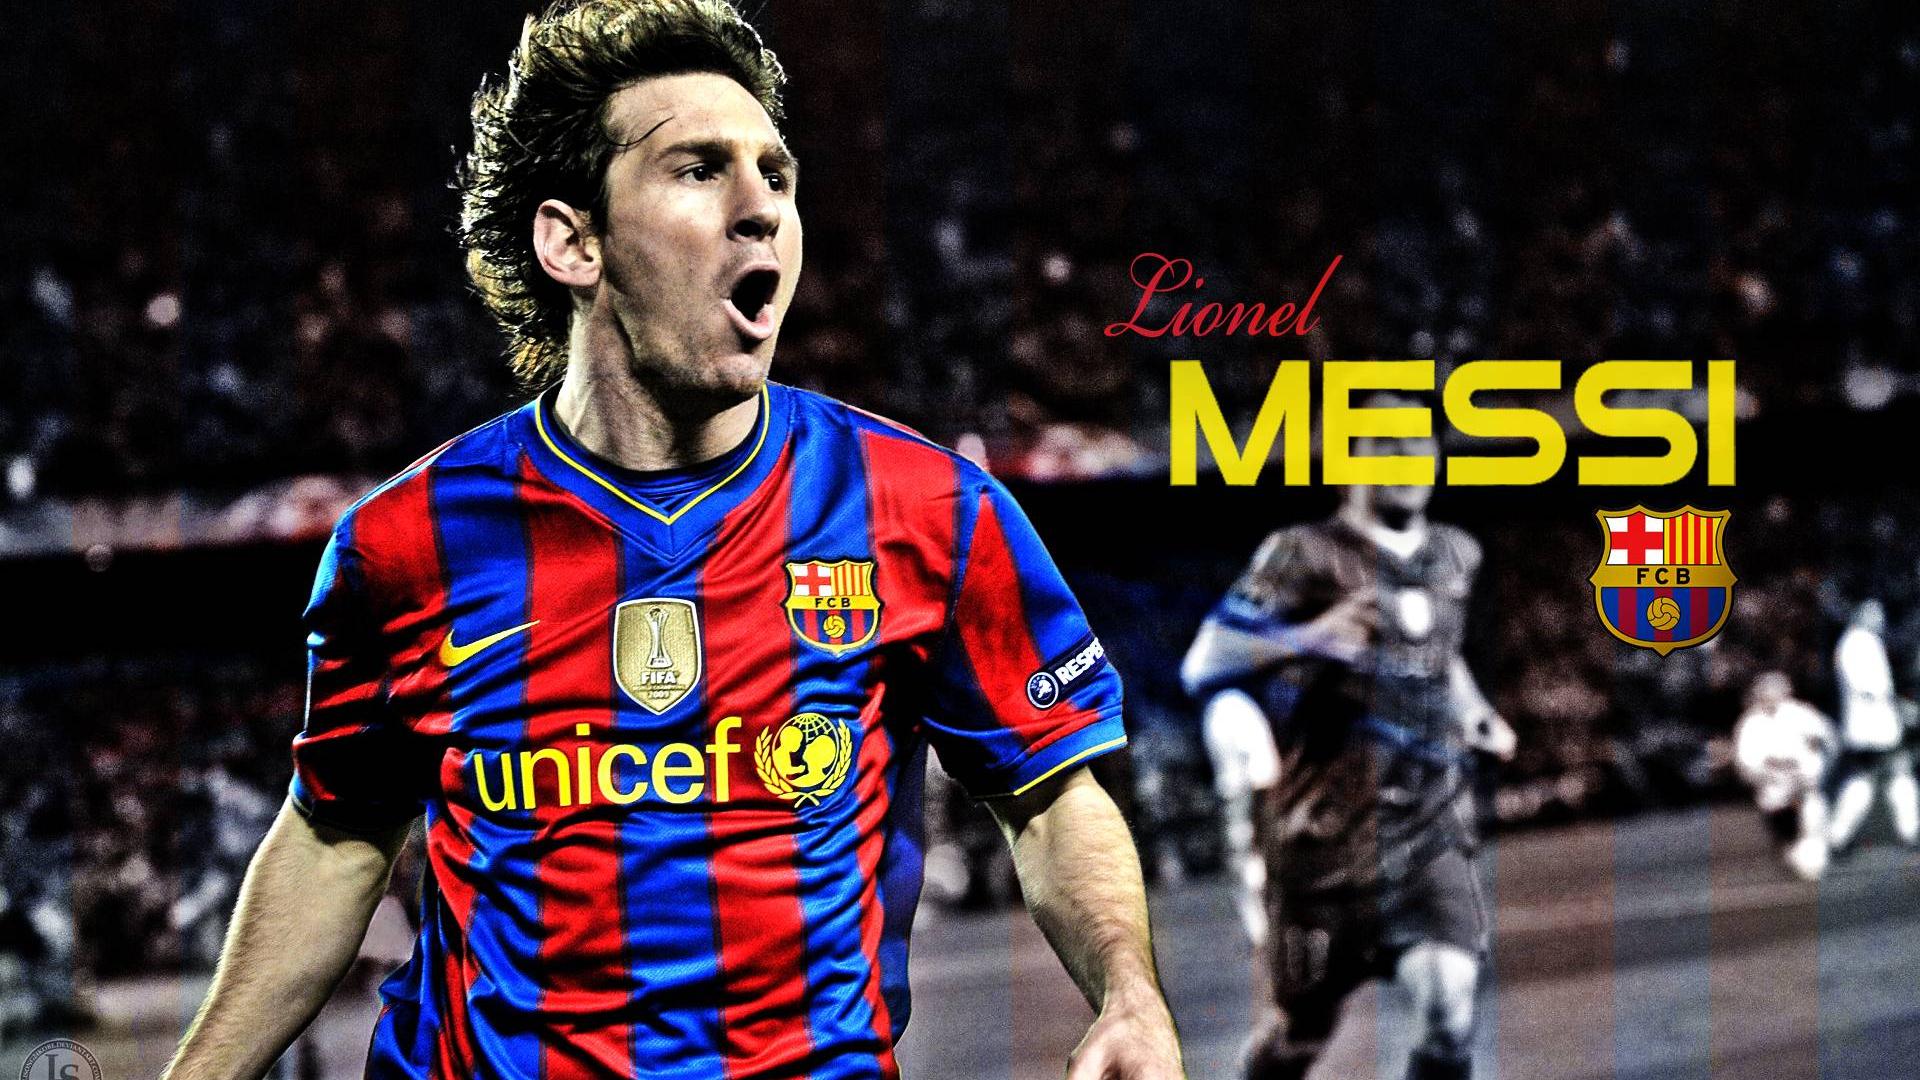 Free Download Messi Vs Ronaldo Duvar Katlar 2016 Hd Messi Vs